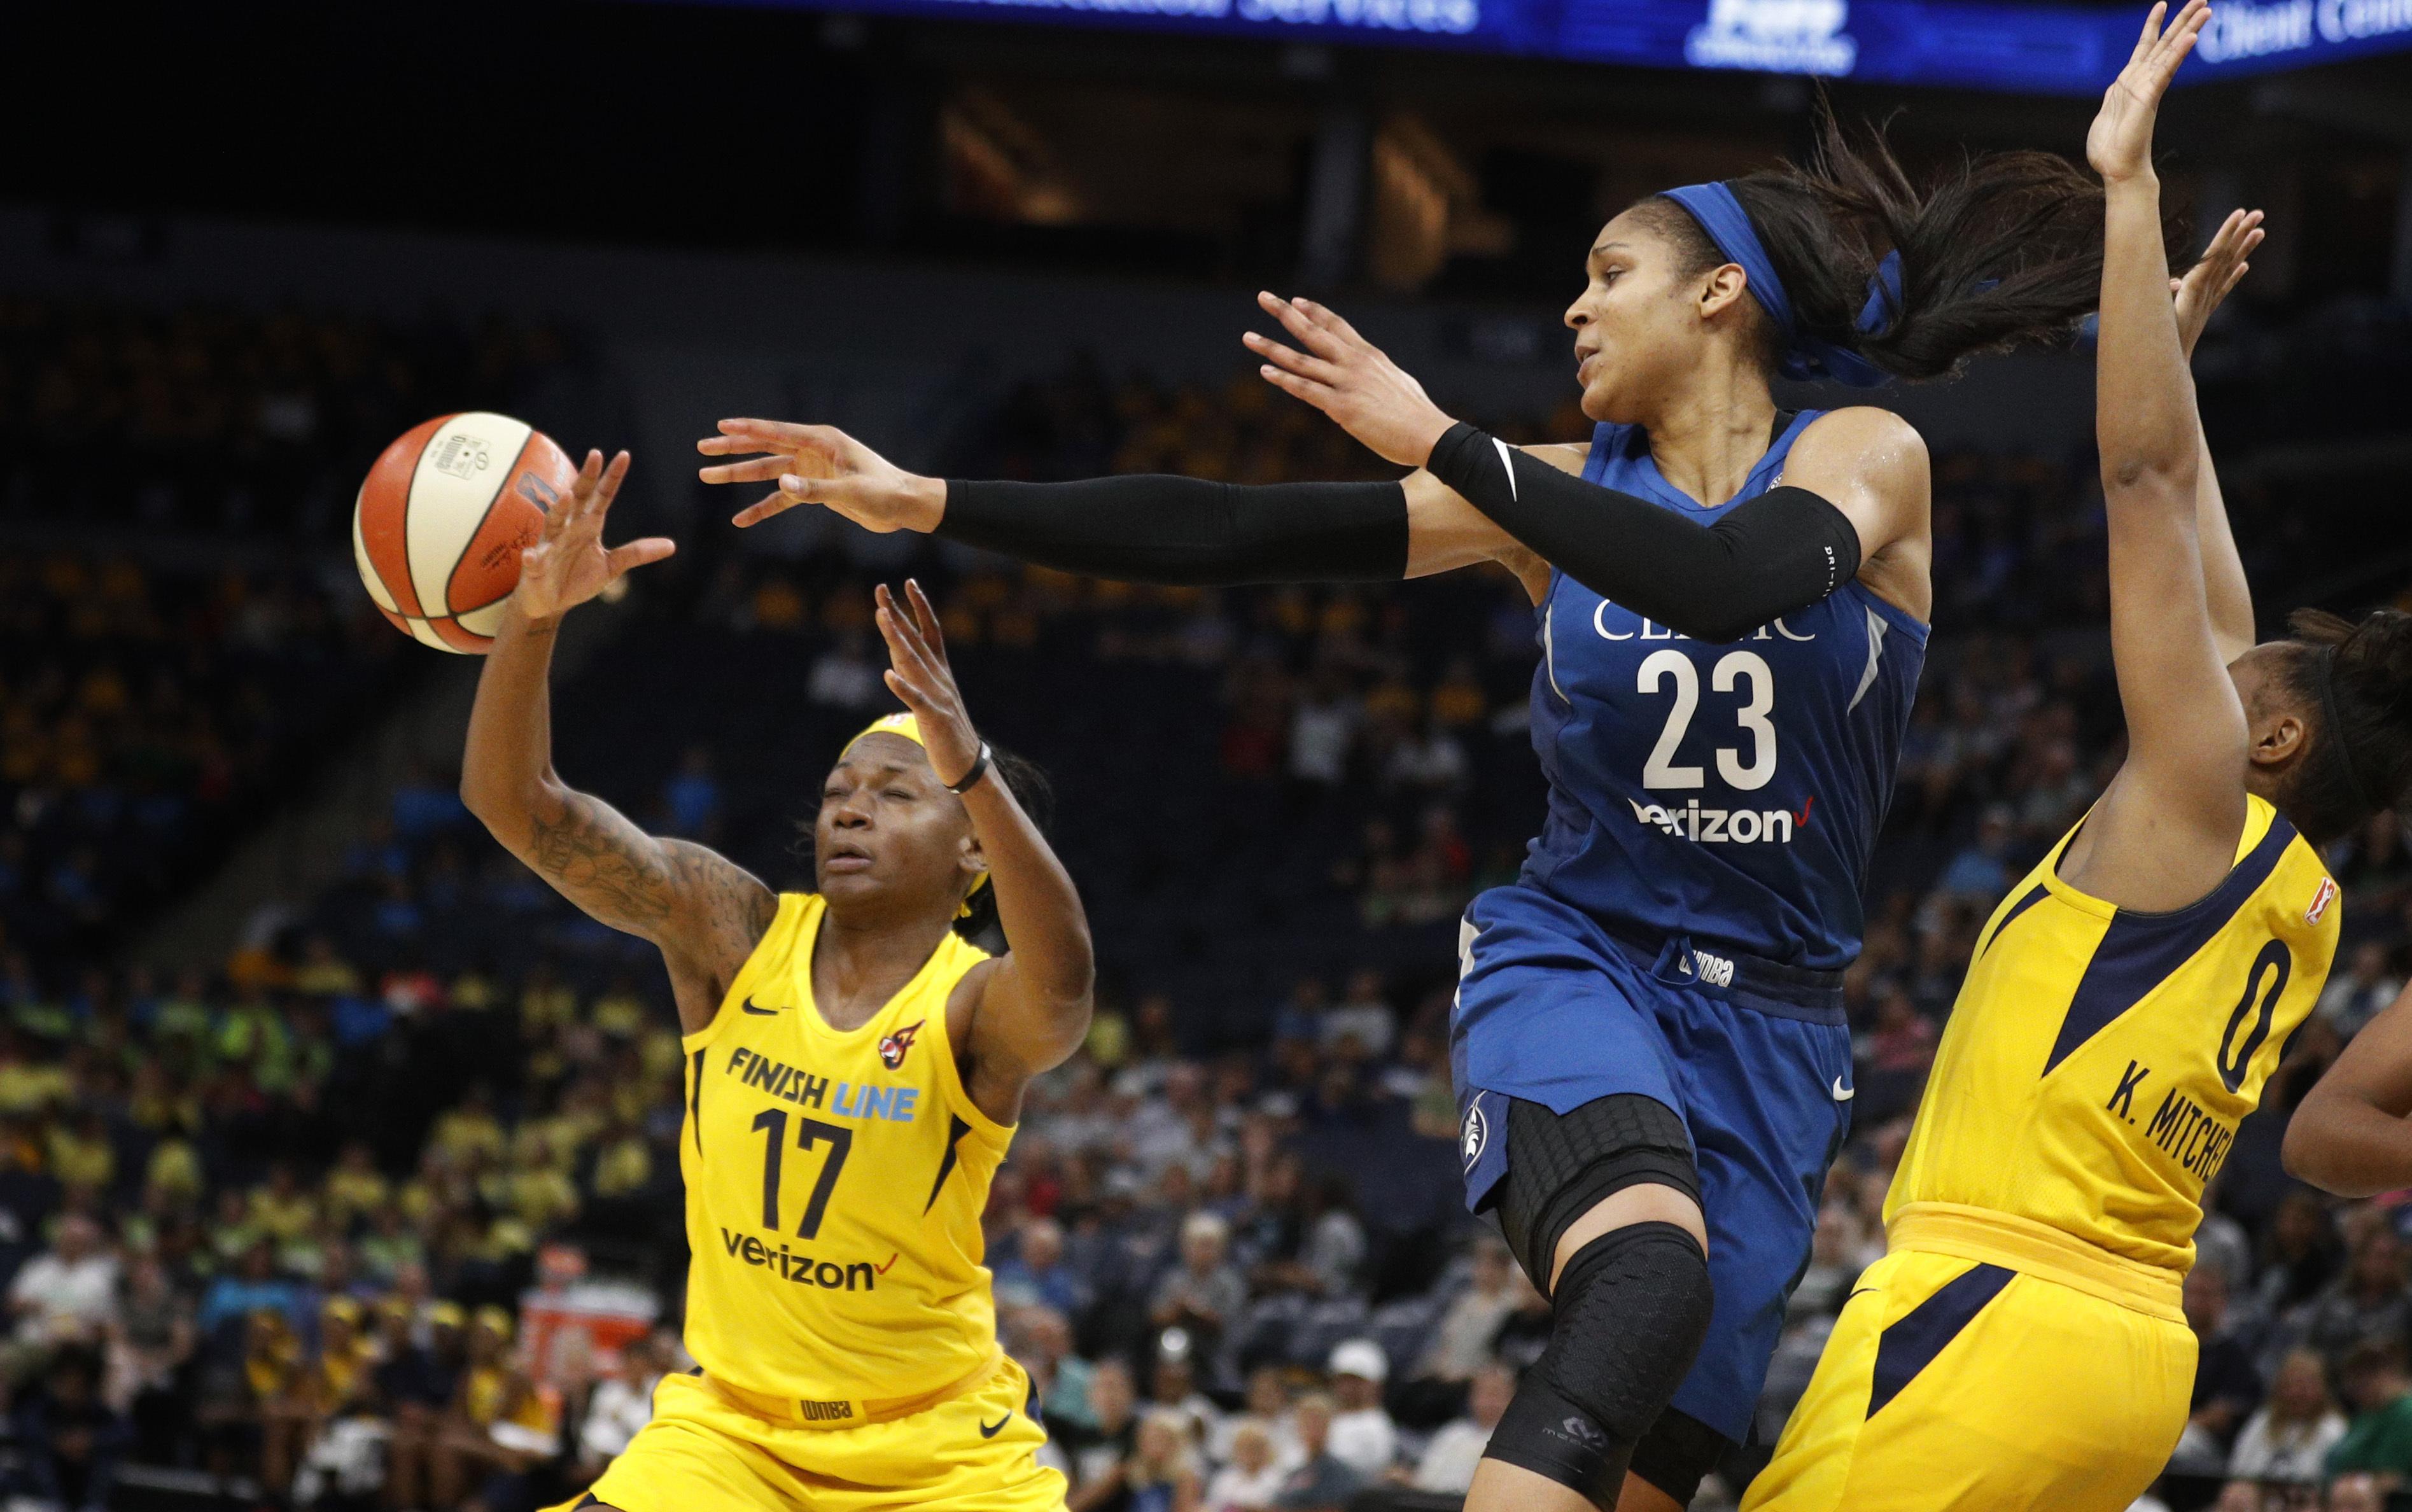 WNBA CBS Sports